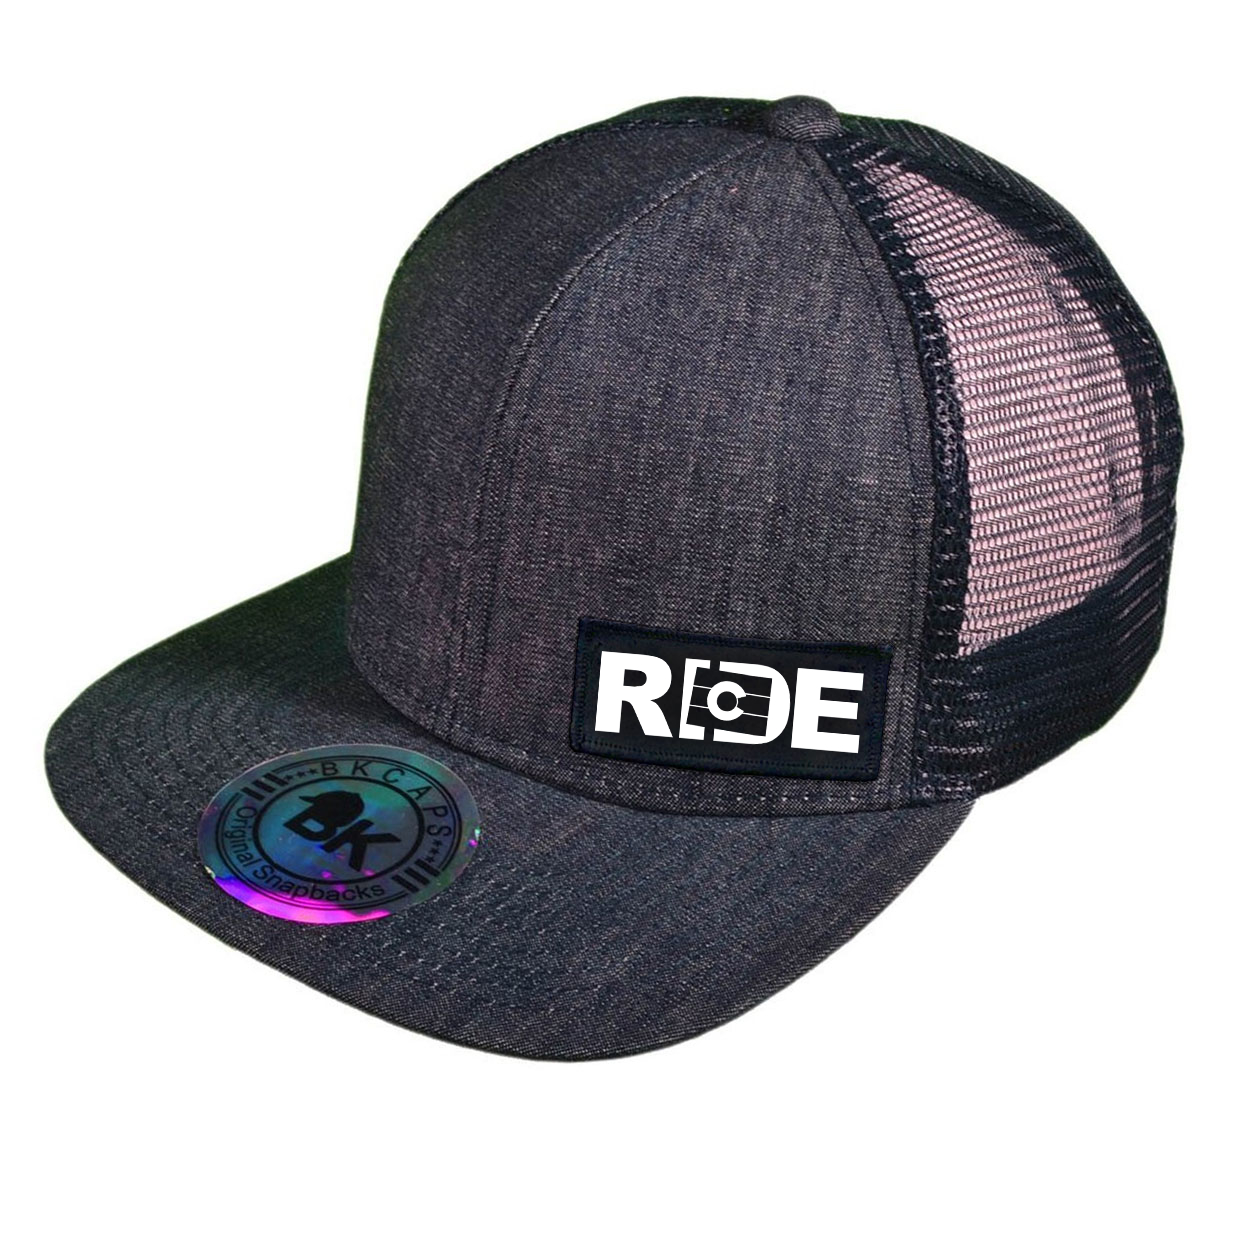 Ride Colorado Night Out Woven Patch Snapback Flat Brim Hat Dark Navy Denim (White Logo)